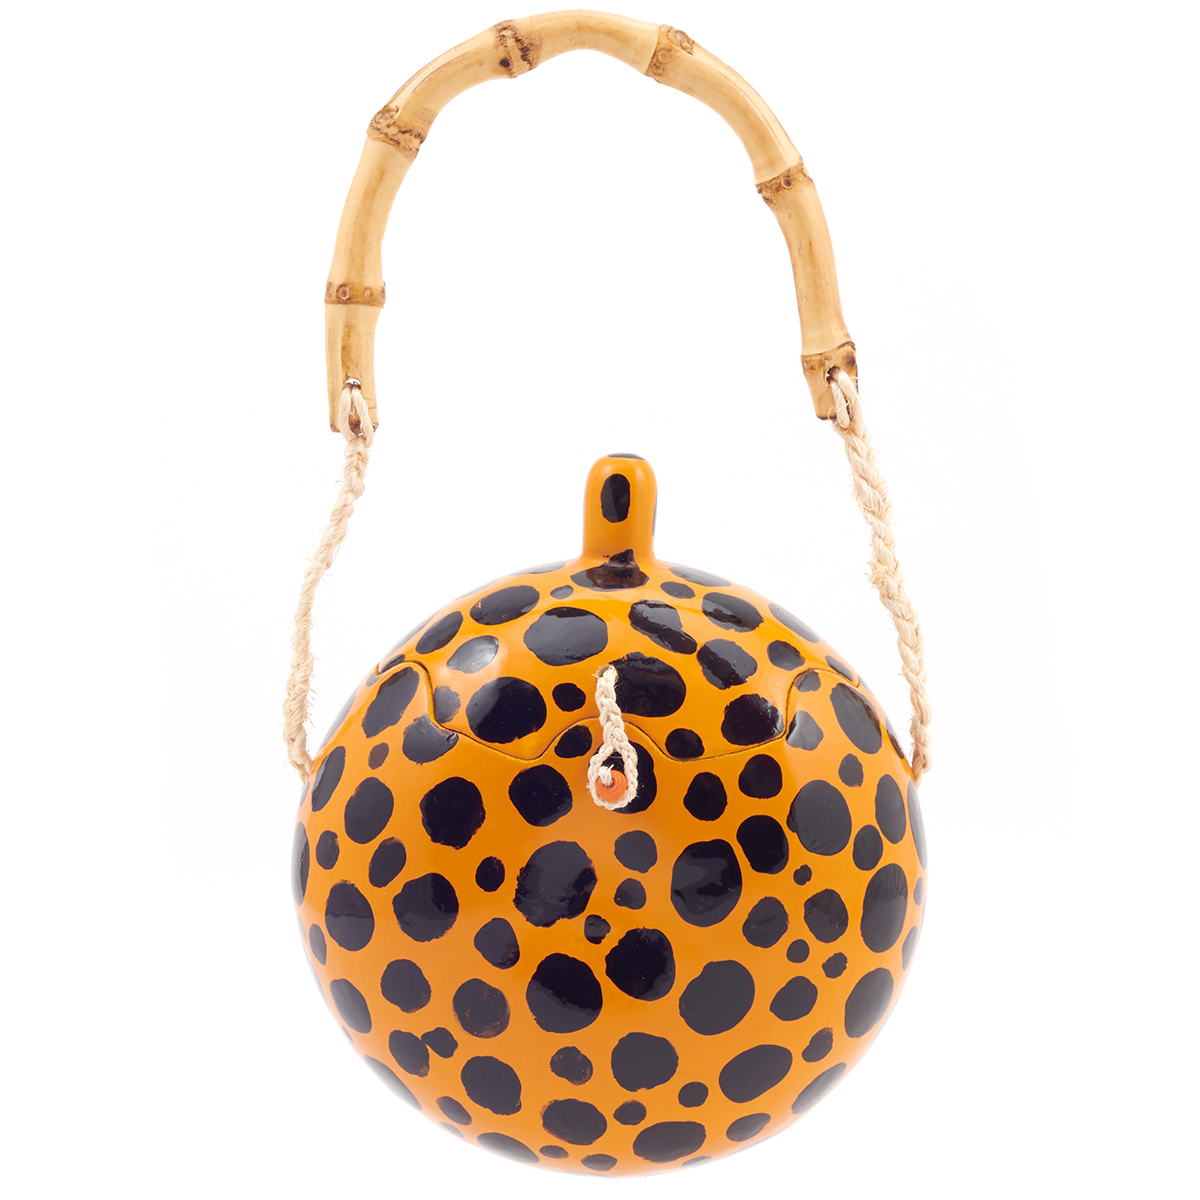 Leopard print guaje bag by Carla Fernandez